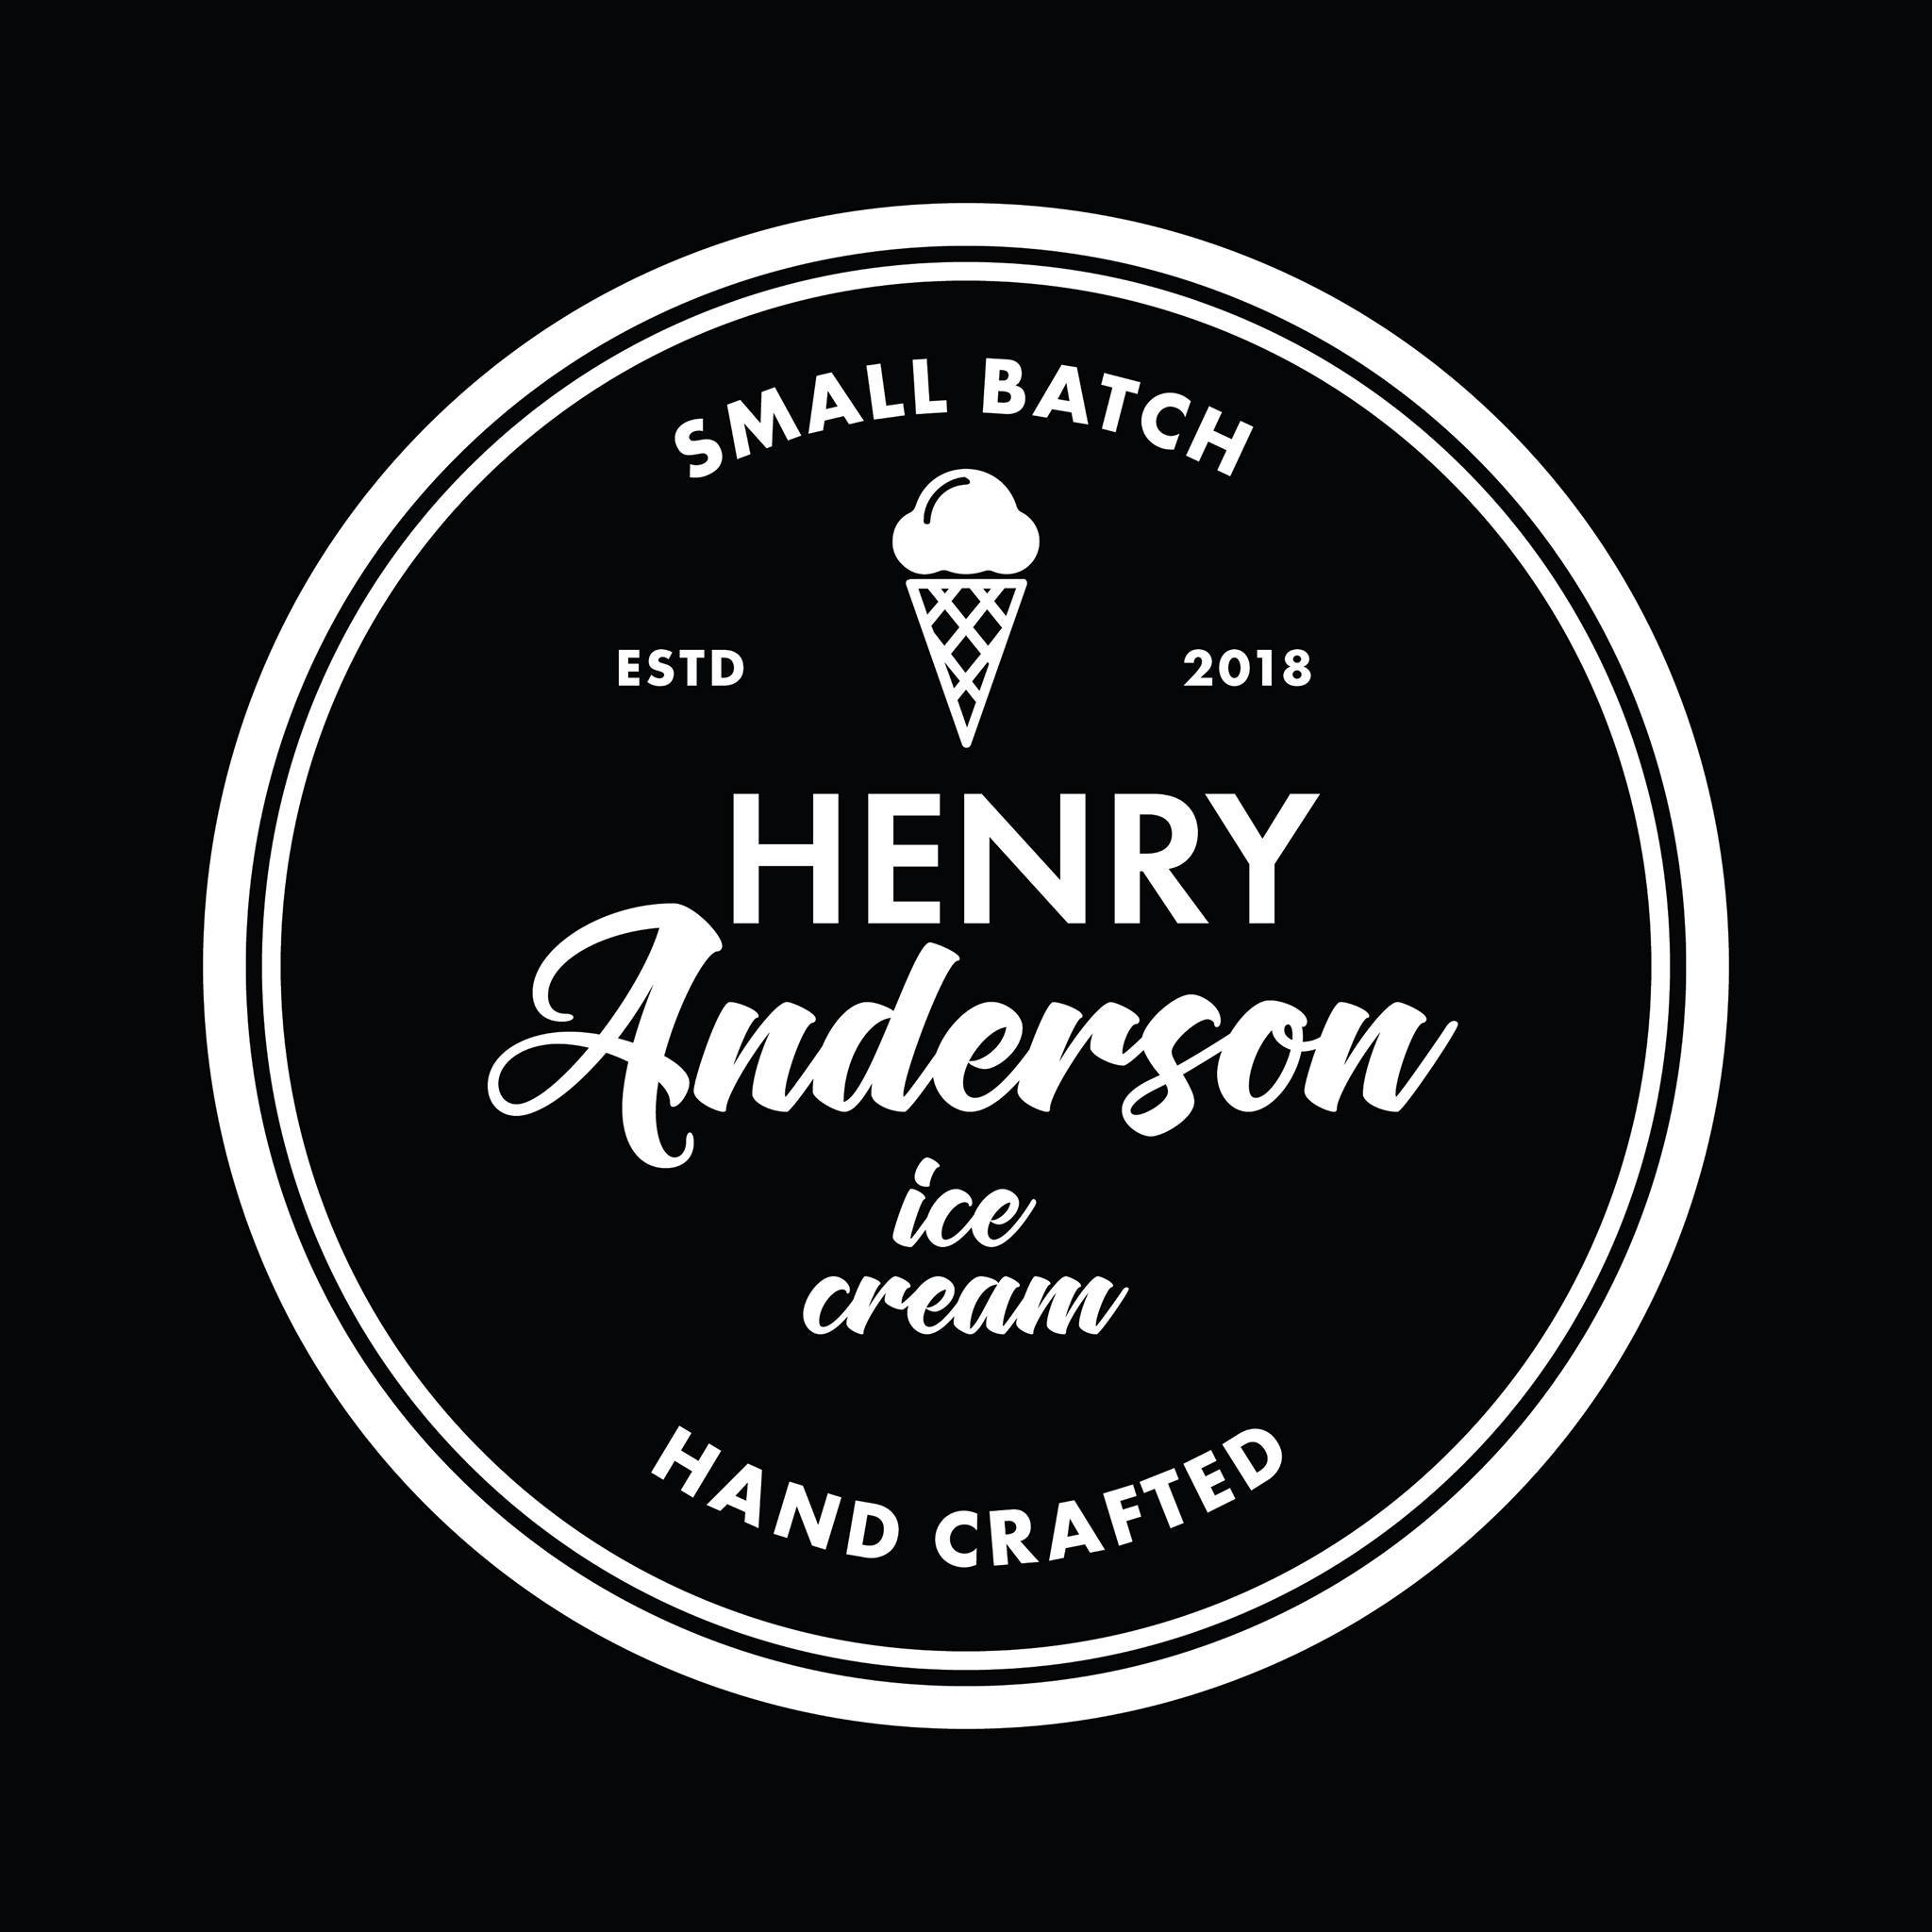 Henry Anderson Ice Cream